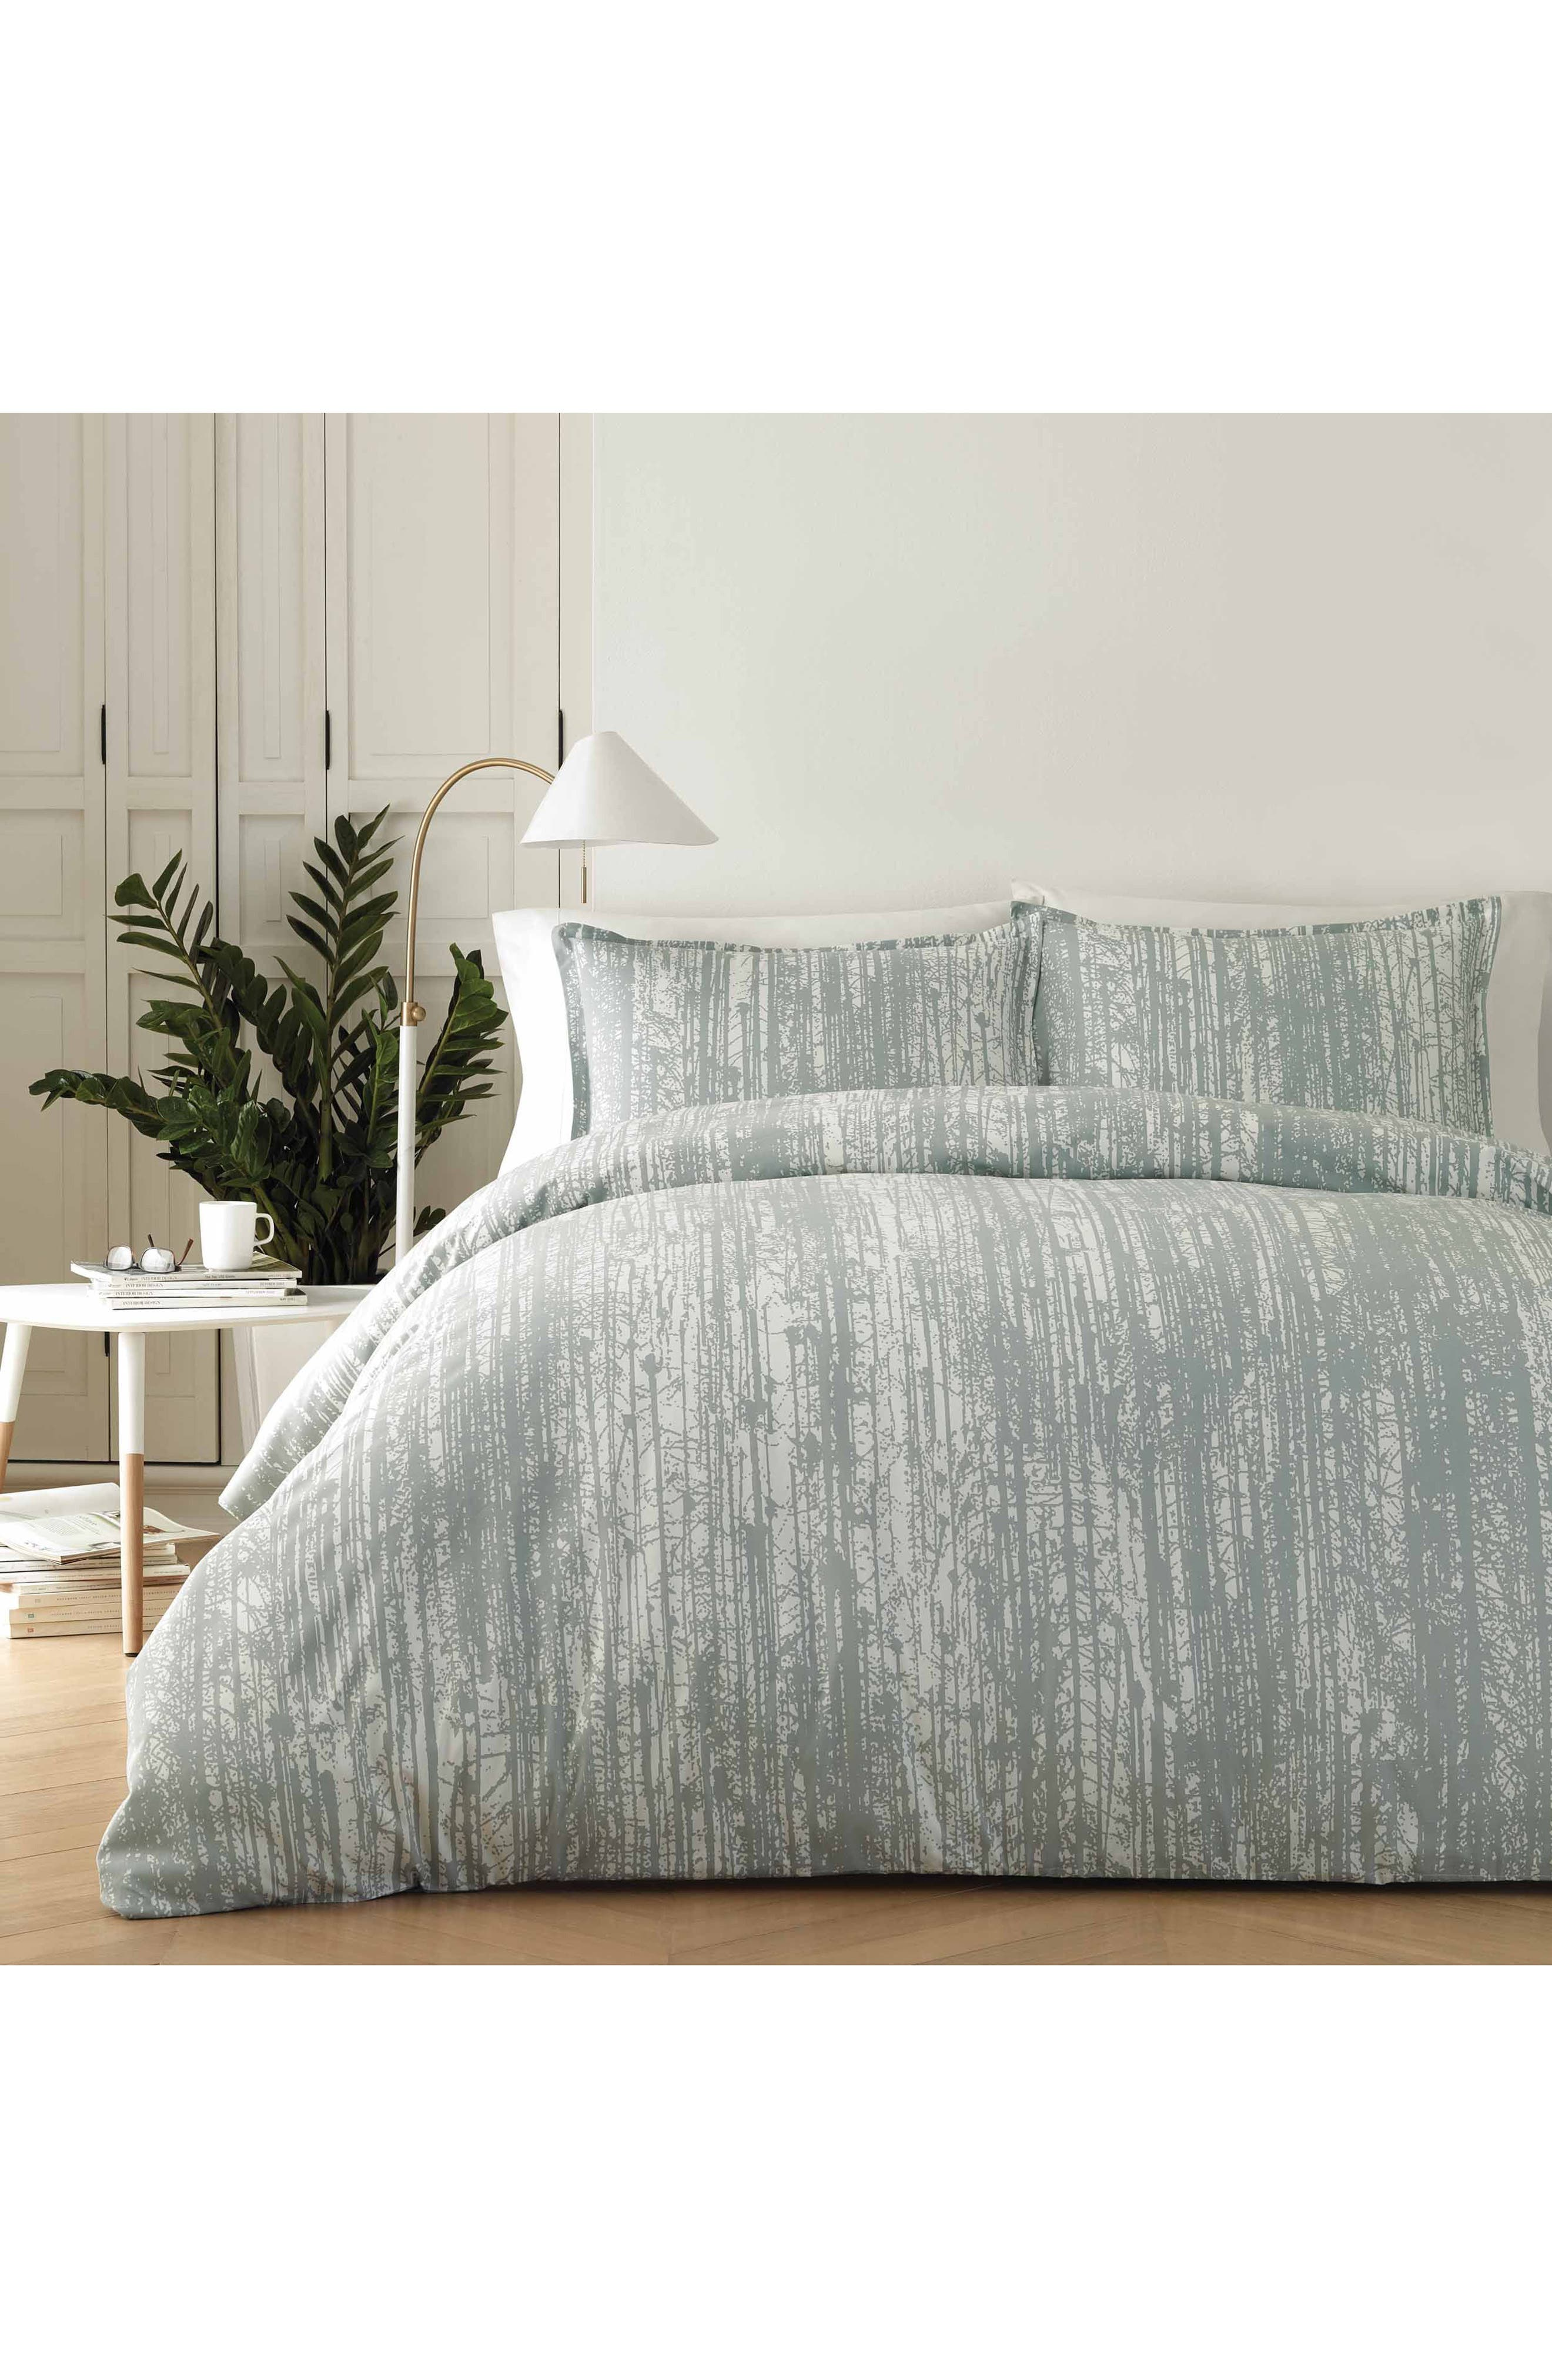 Main Image - Marimekko Pihkassa Comforter & Sham Set